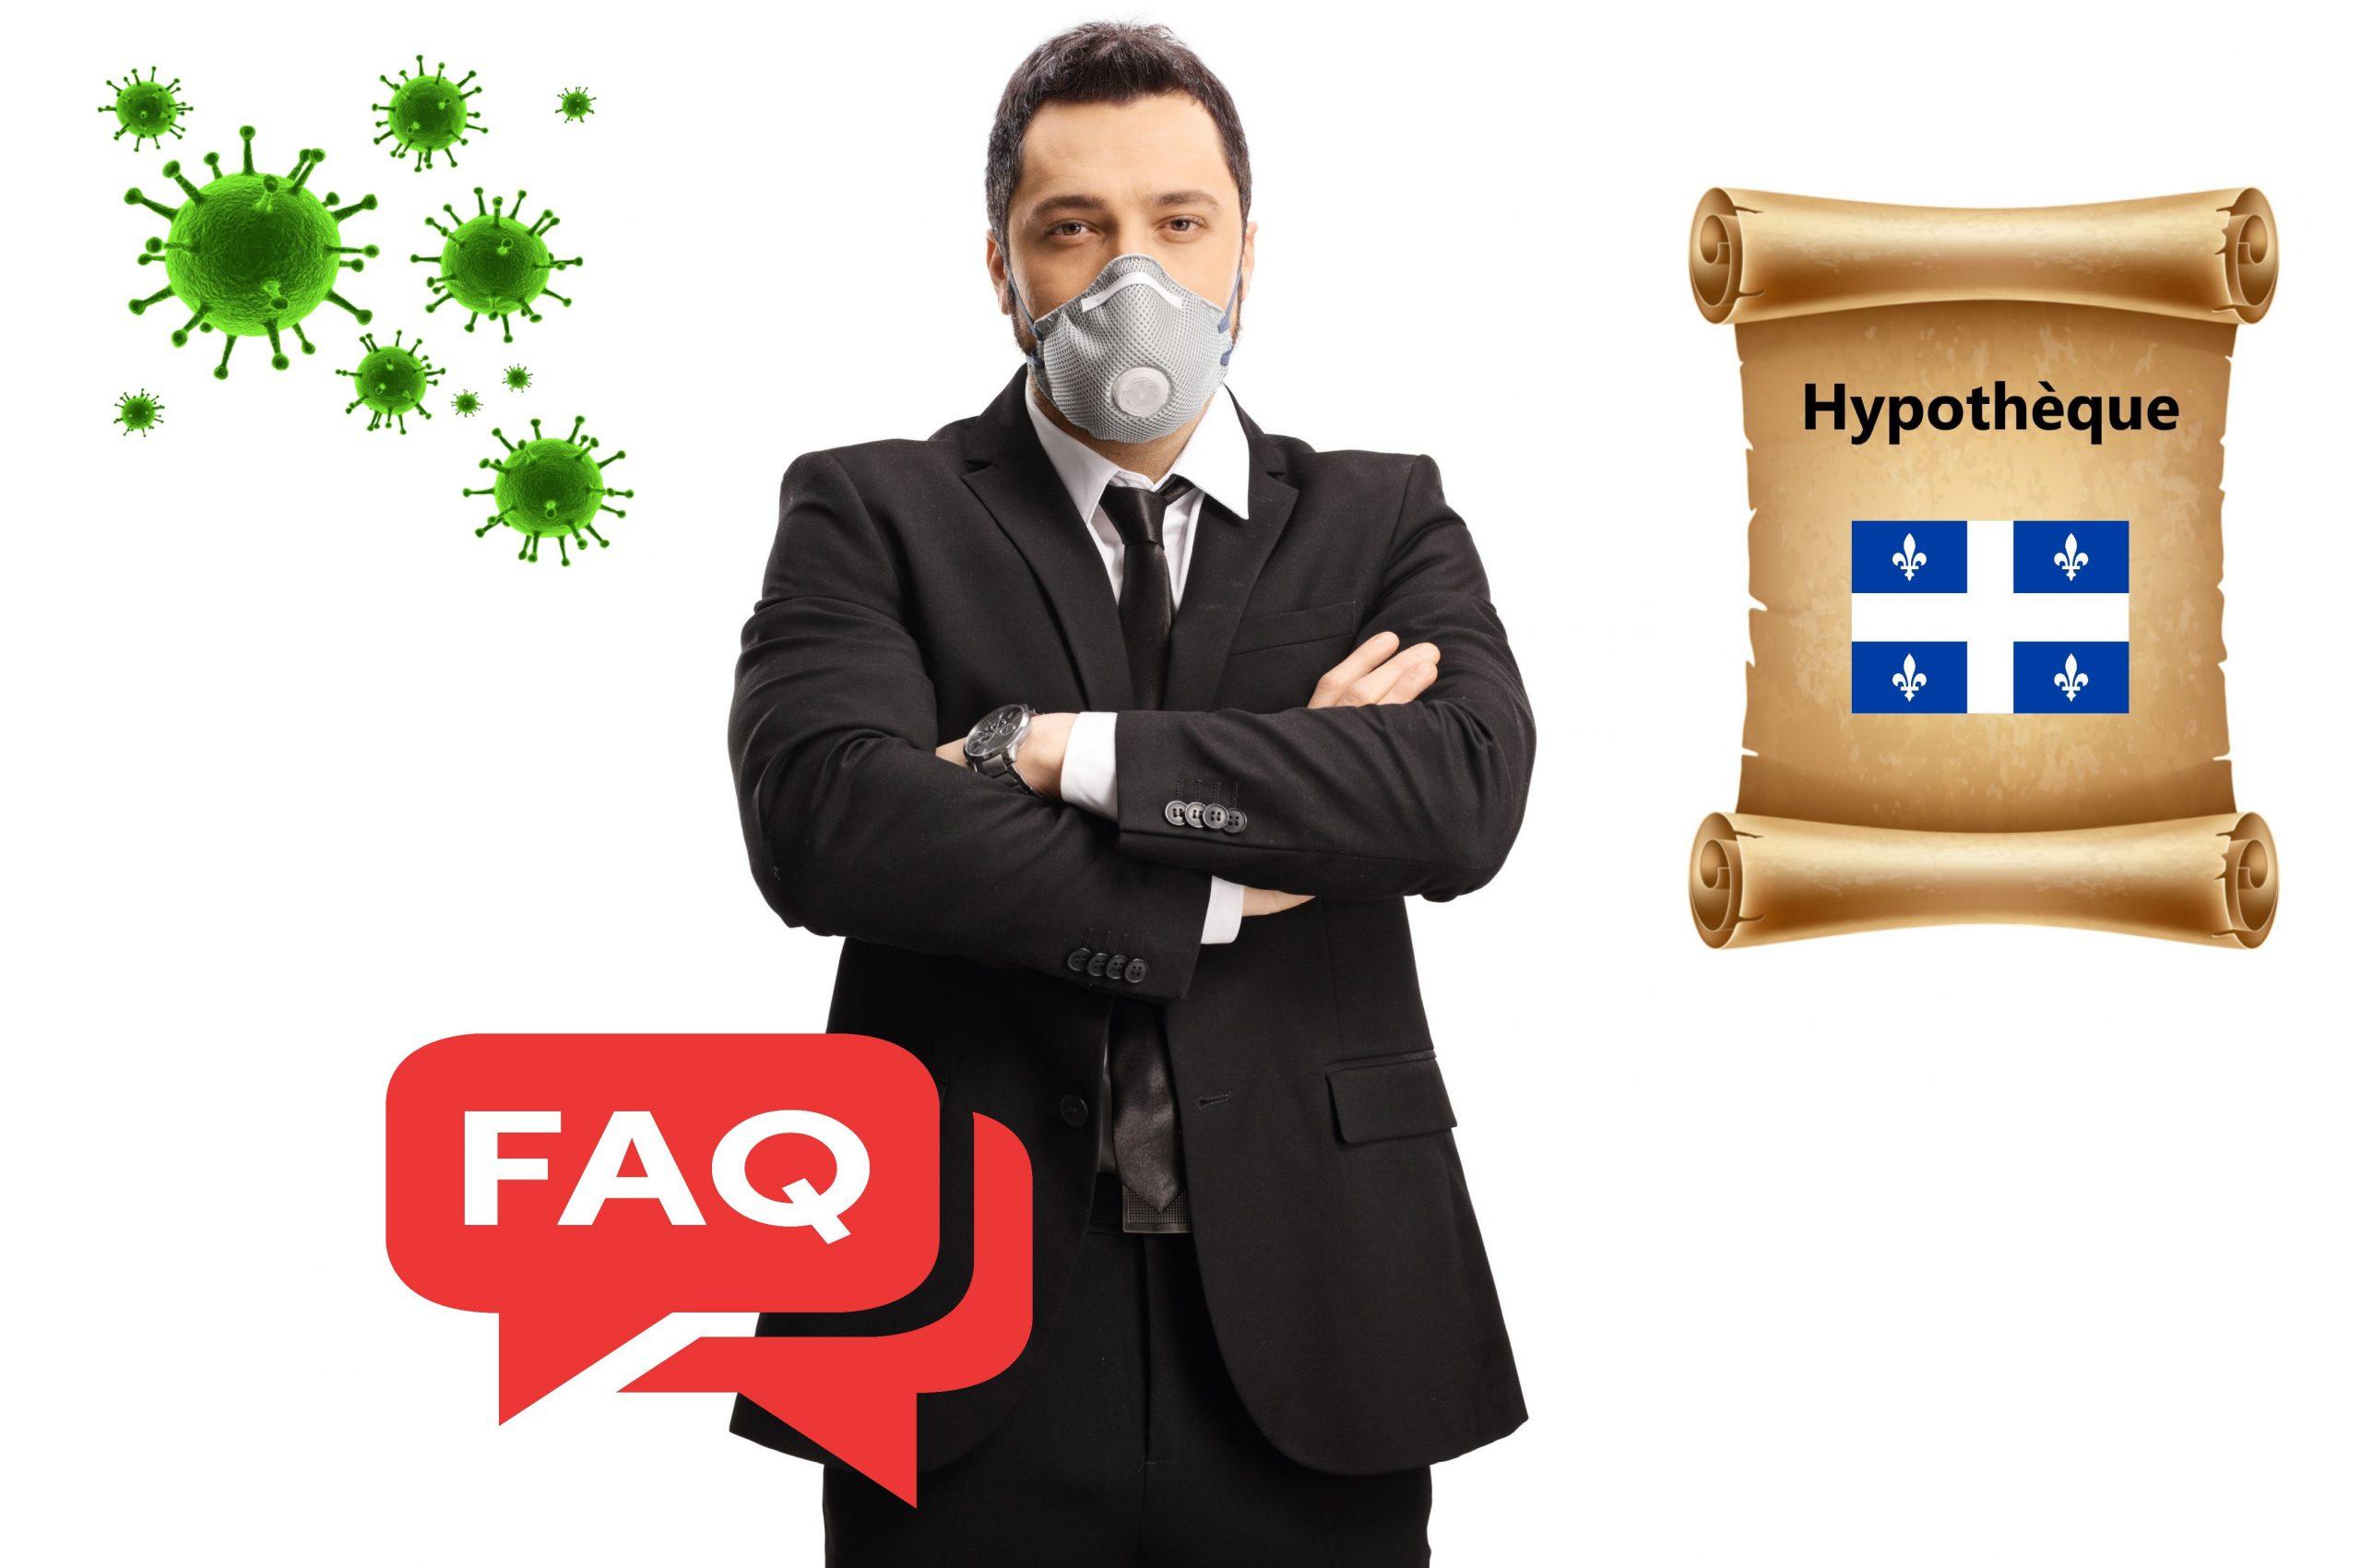 magasiner hypotheque pandemie quebec 2020